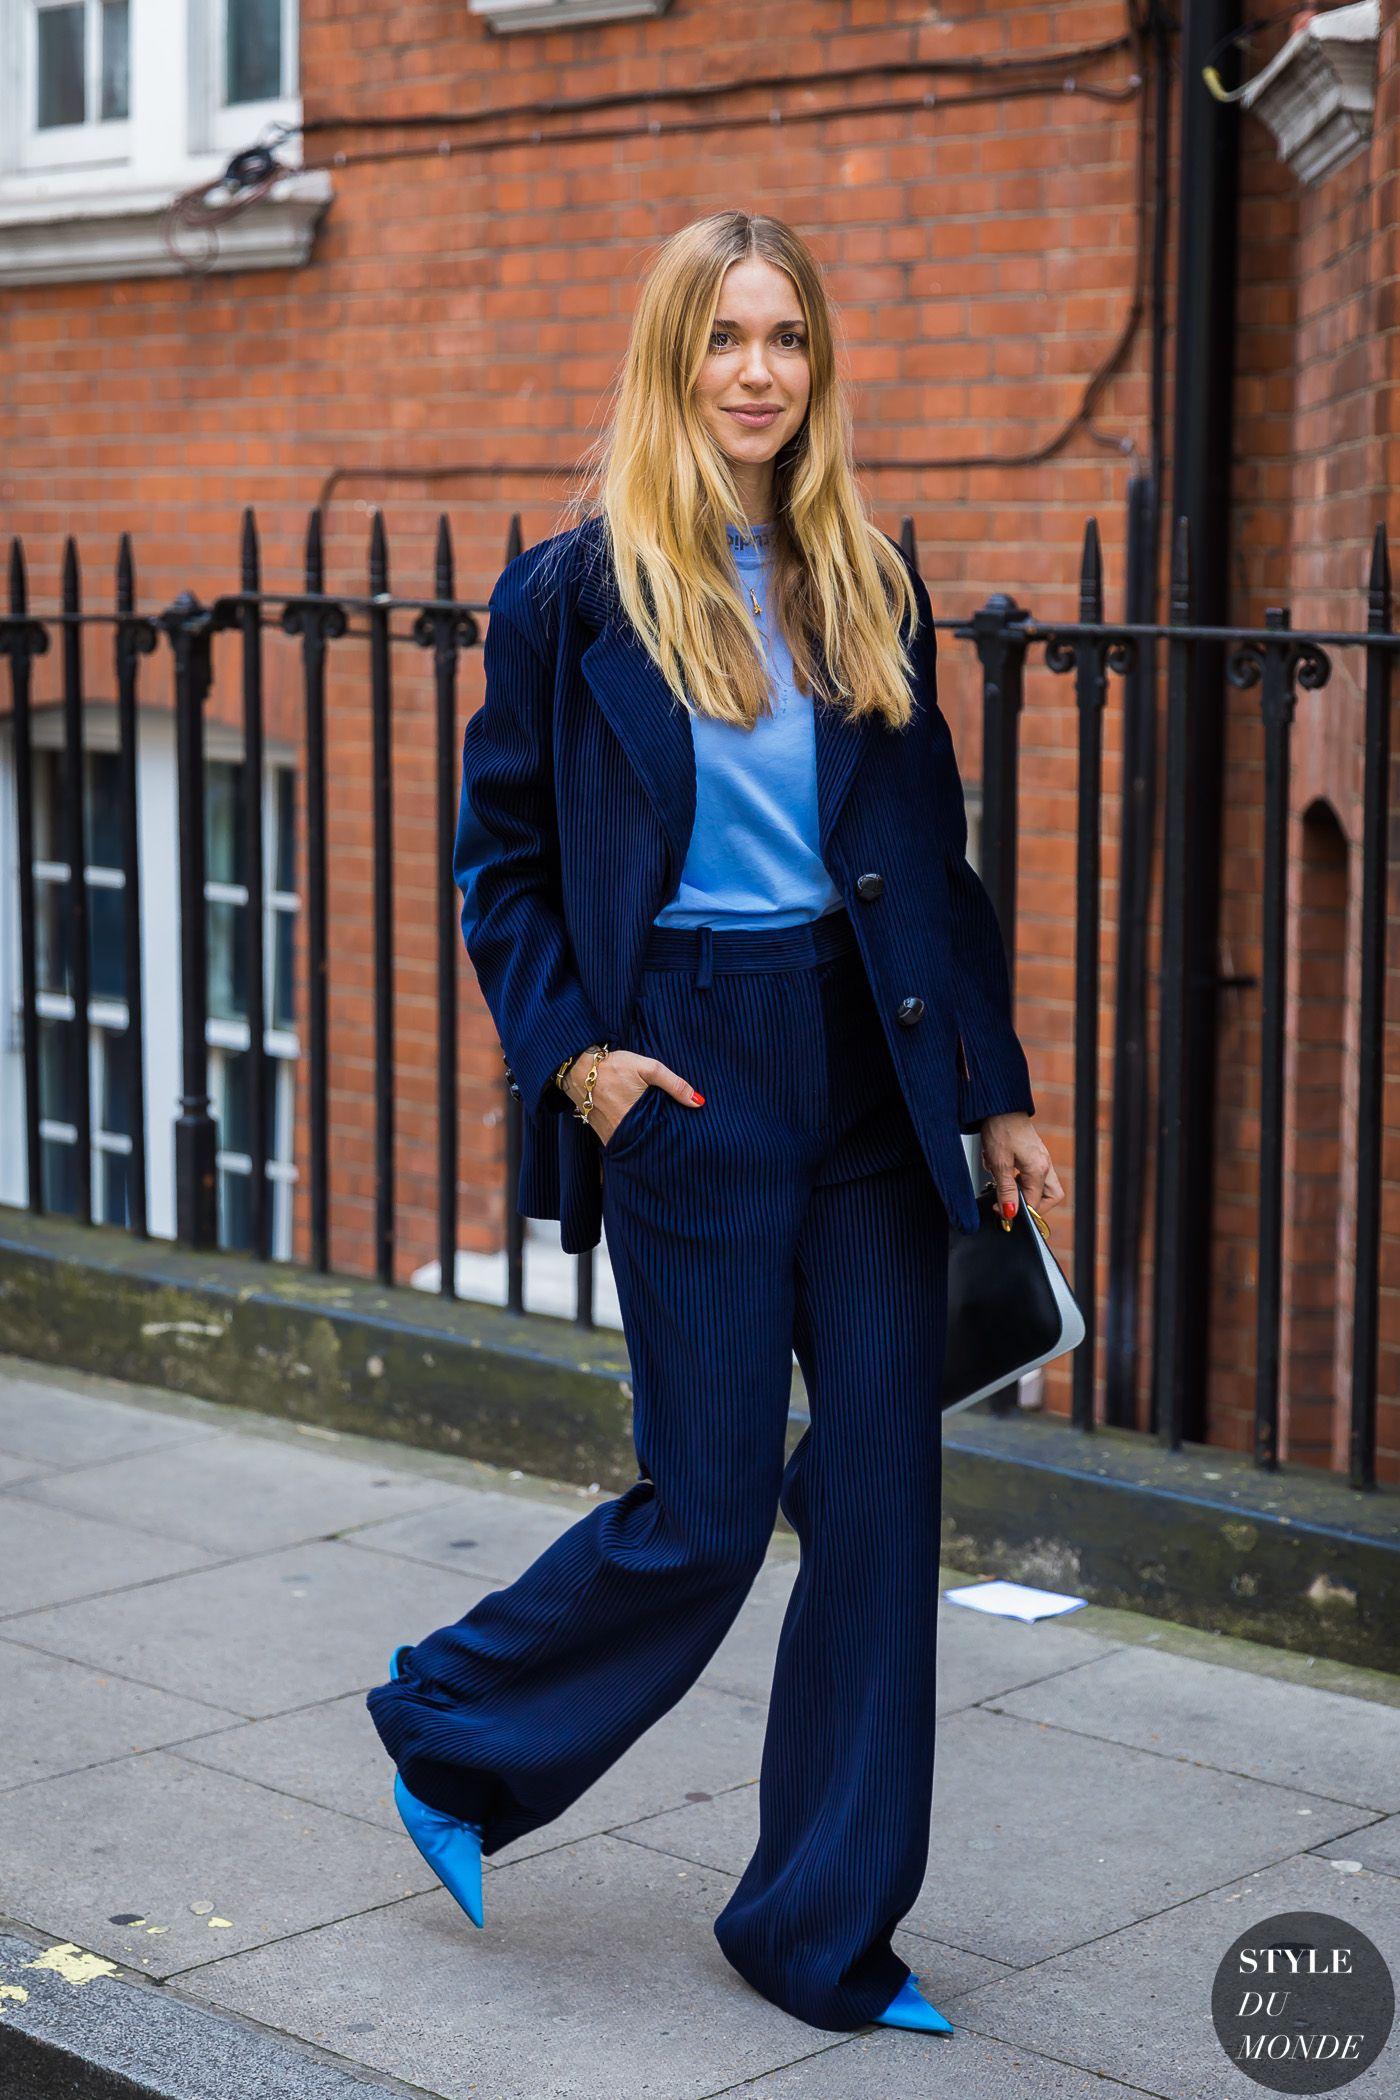 Pernille Teisbaek by STYLEDUMONDE Street Style Fashion Photography Pinterest: KarinaCamerino